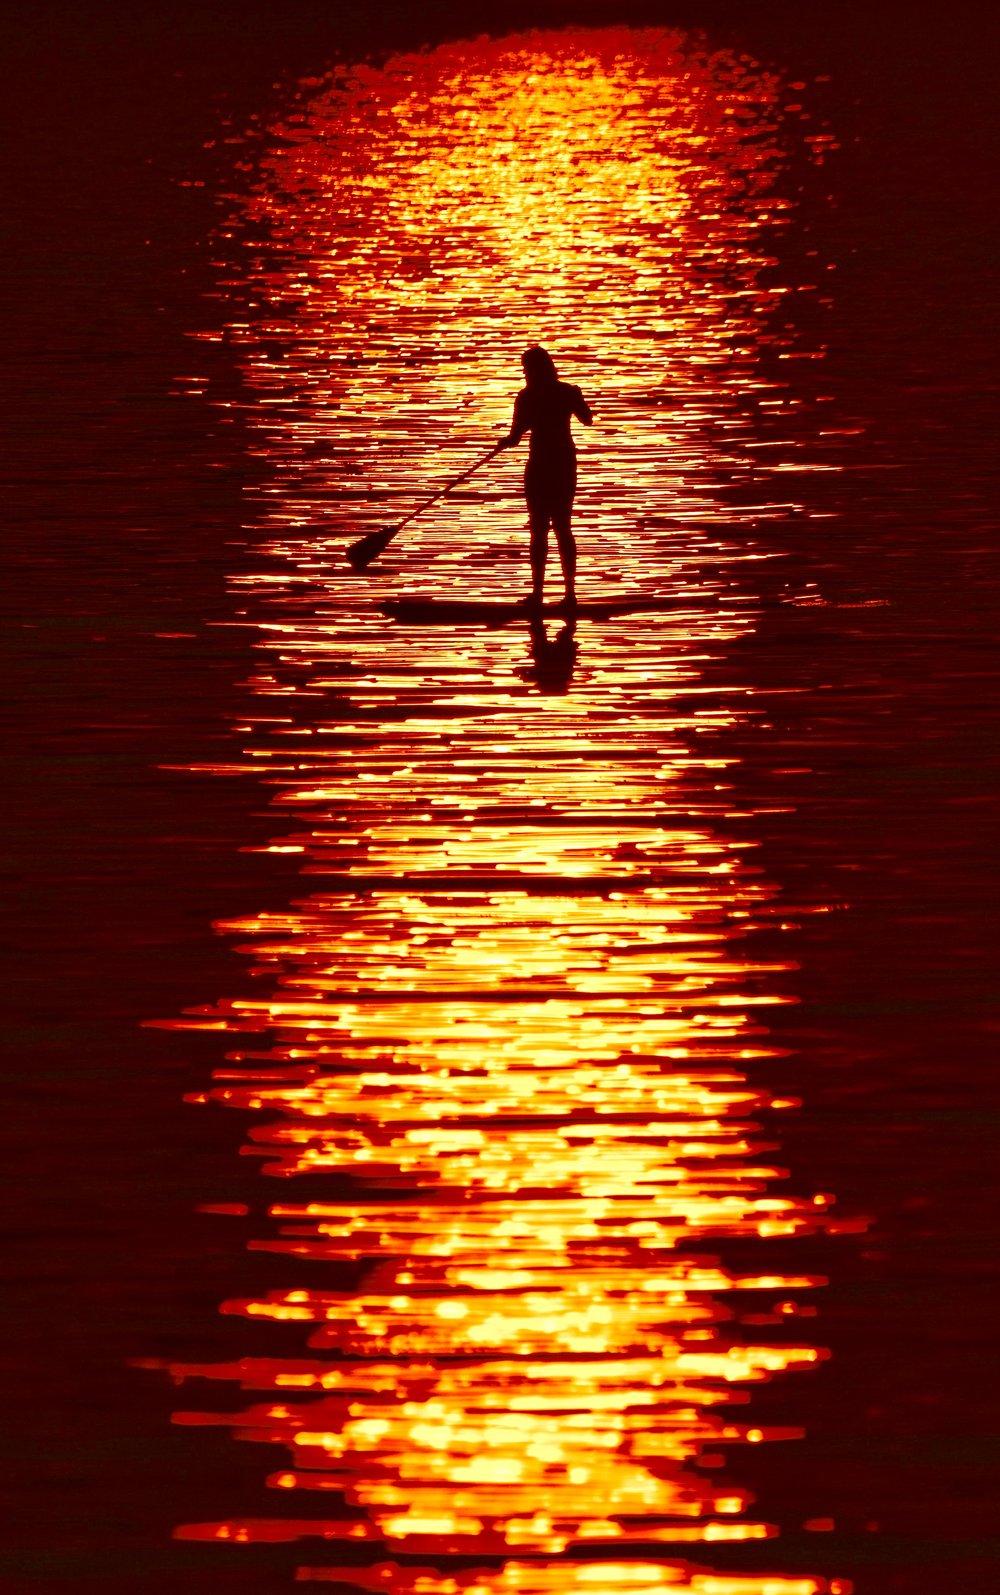 Paddleboarder on Lake Champlain at Sunset_1